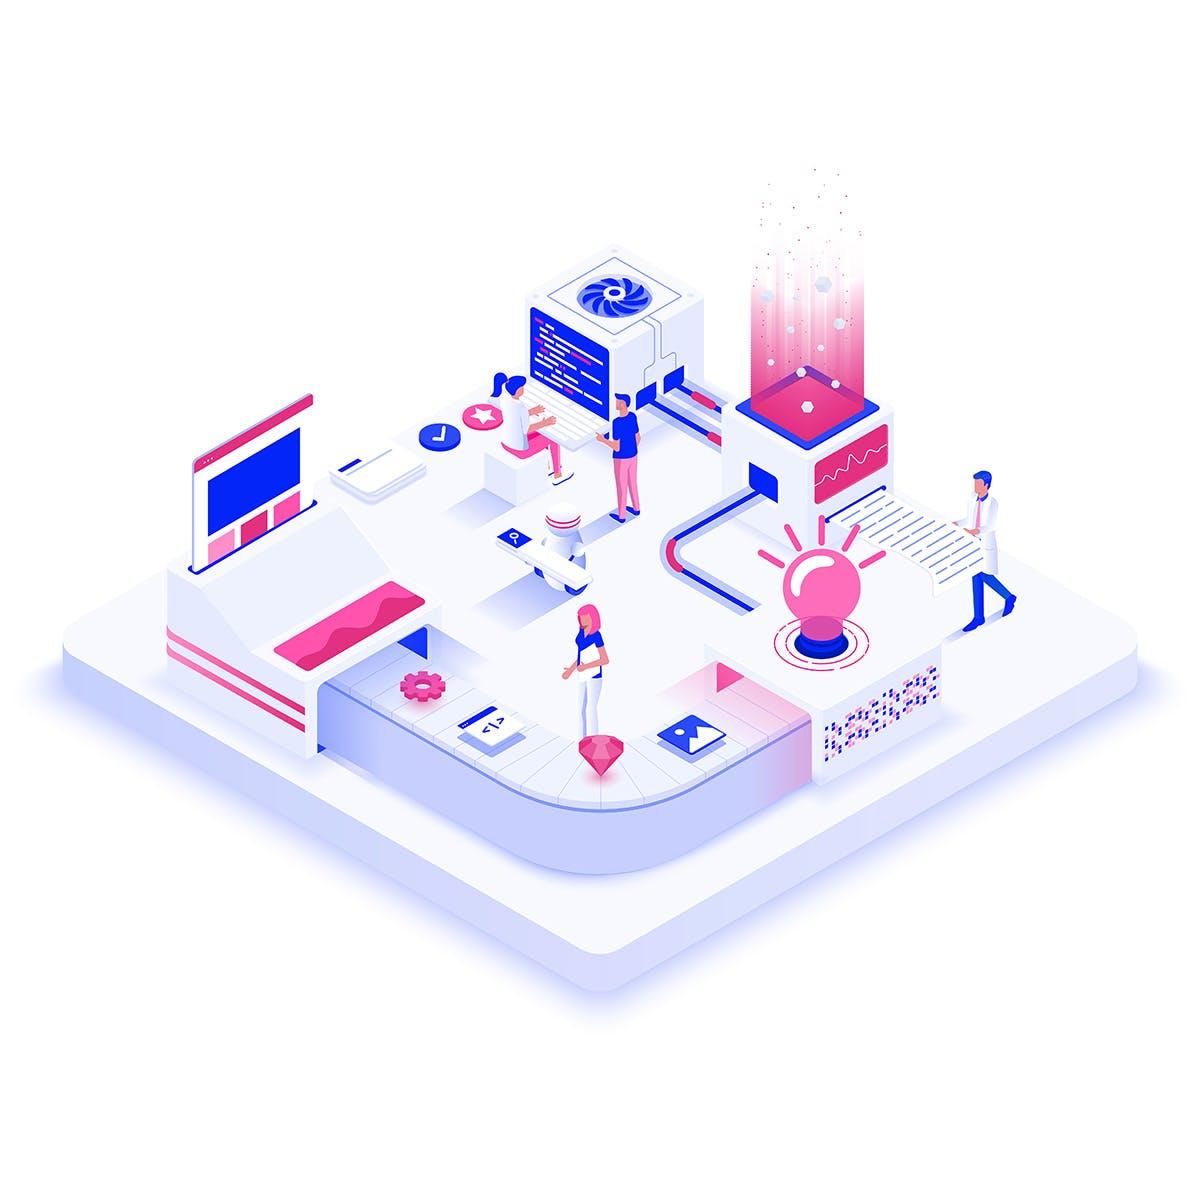 3D立体2.5D高科技5G移动通信科技卡通手绘插画banner元素大集合(AI,EPS,JPG,PDF)